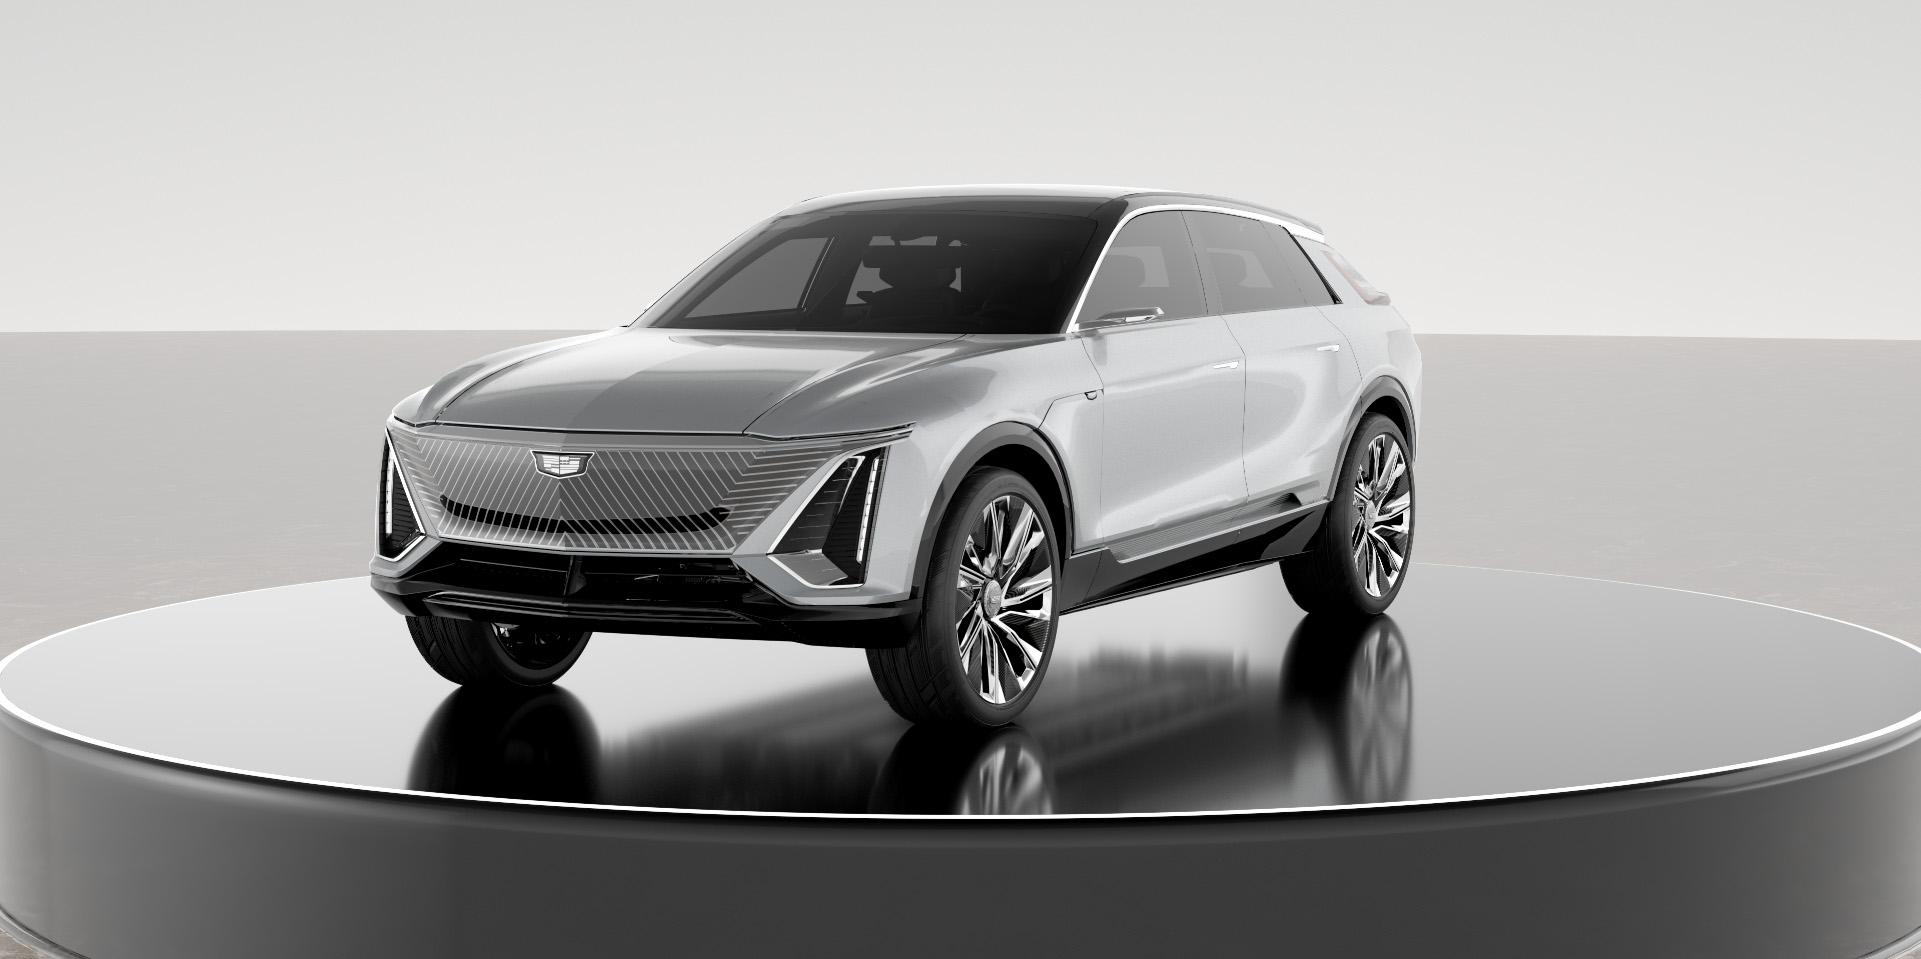 GM revela detalles del futuro de sus autos en el CES 2021